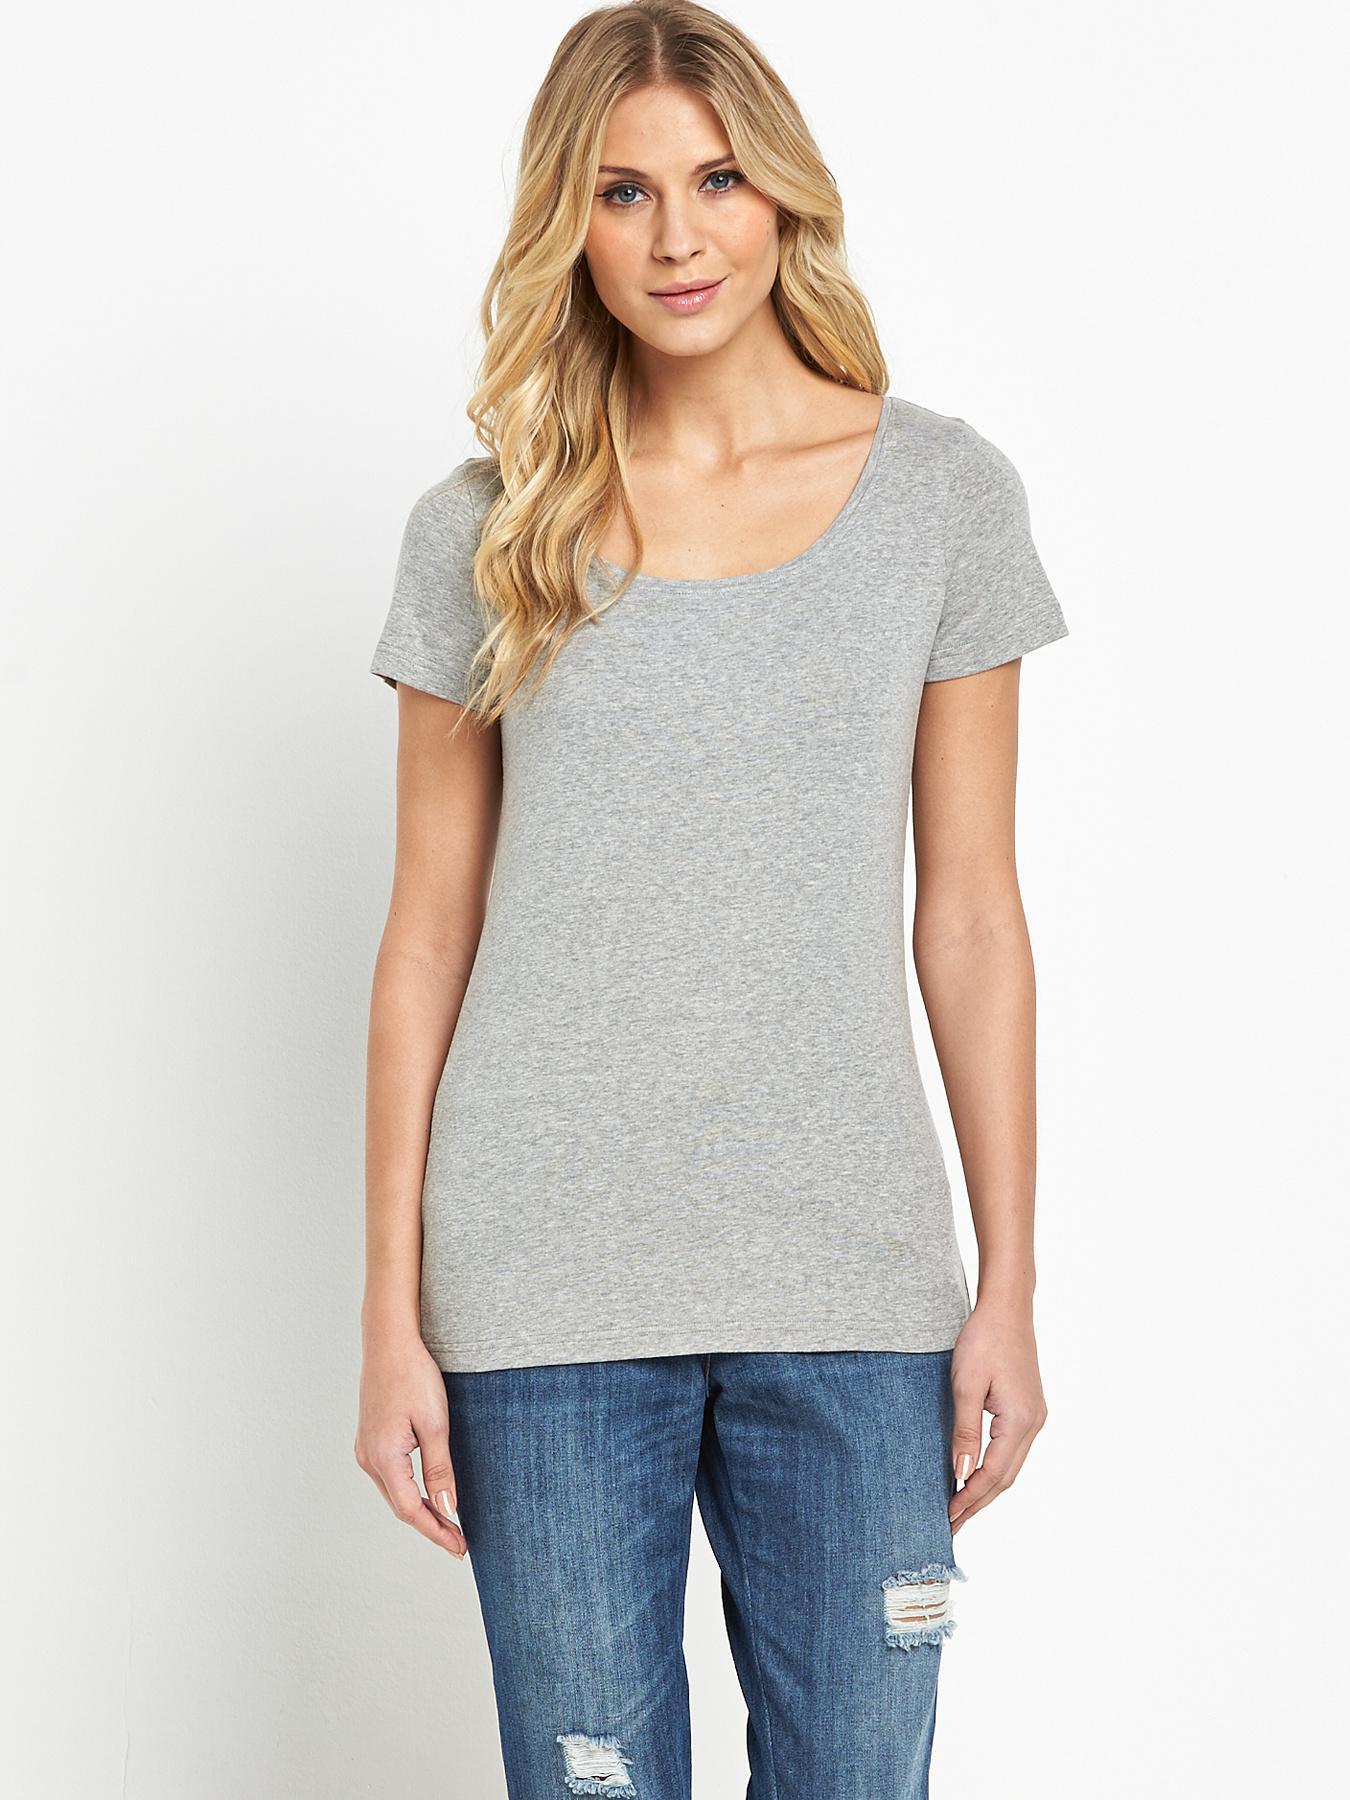 Short Sleeved Scoop T-shirt, Grey,White,Navy,Black at Littlewoods